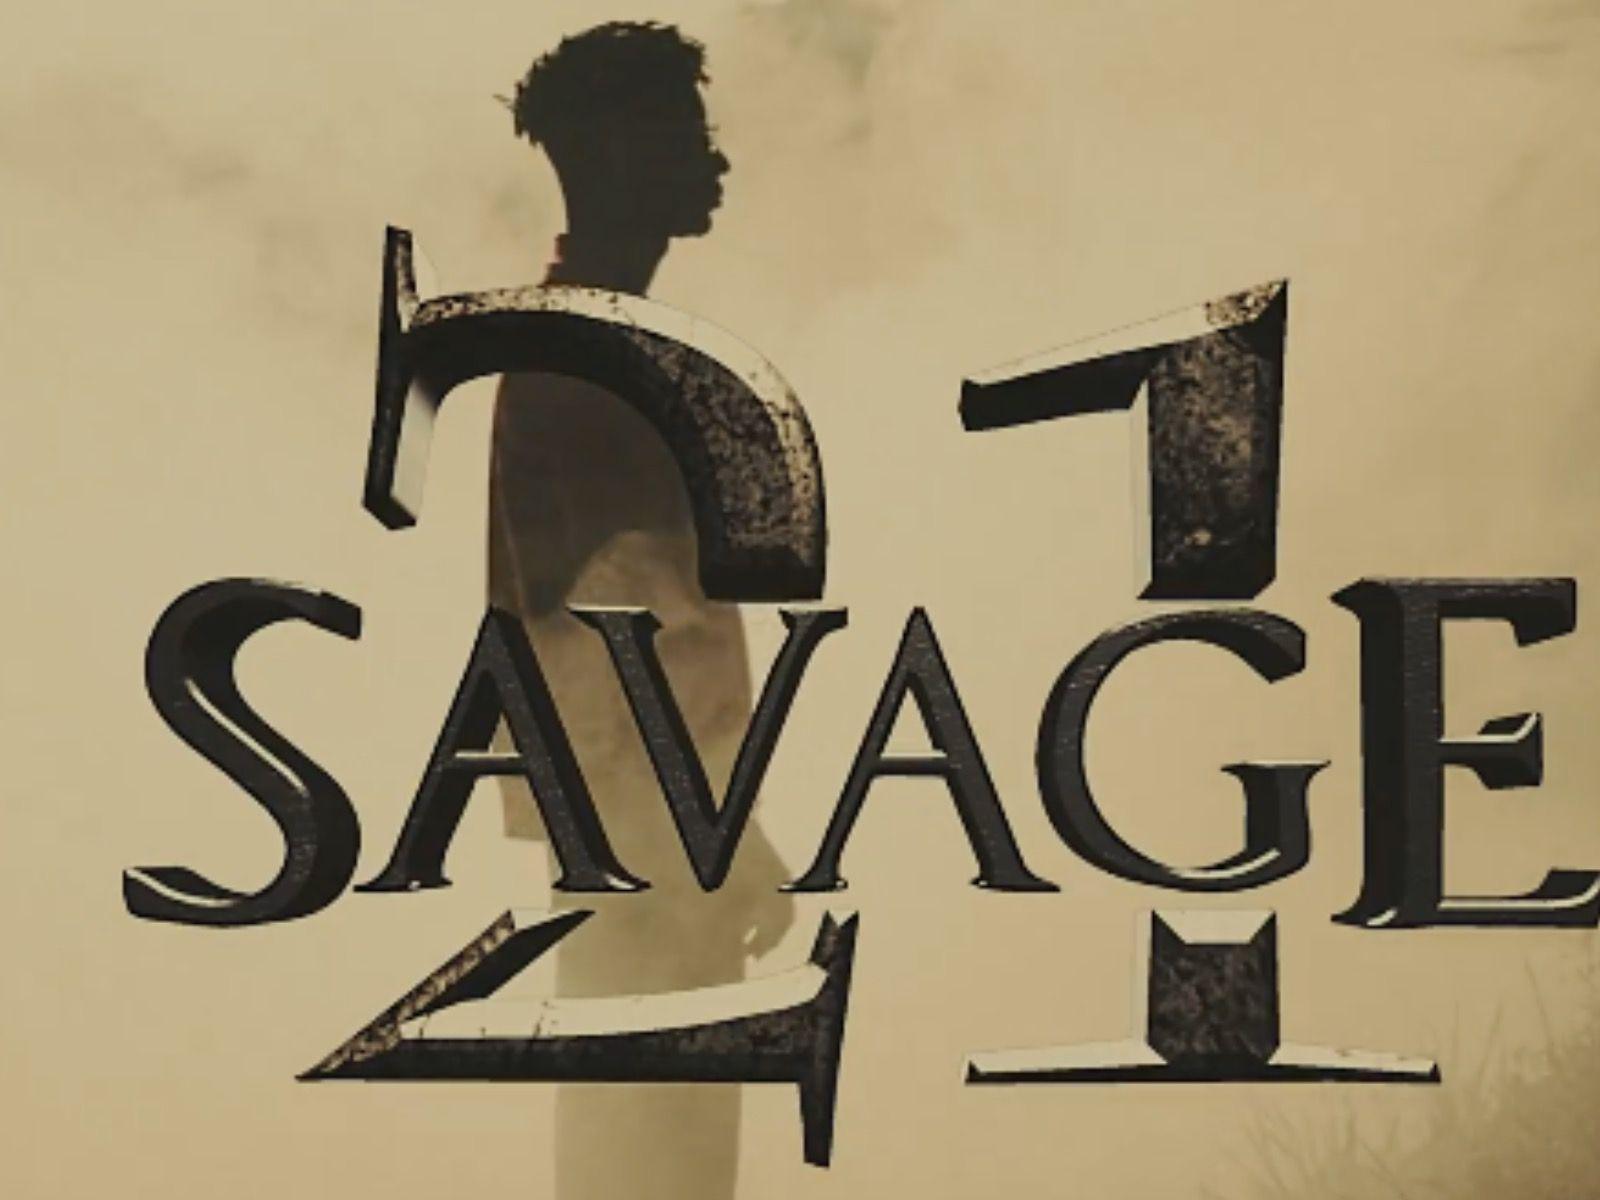 issa 21 savage wallpapers top free issa 21 savage backgrounds wallpaperaccess issa 21 savage wallpapers top free